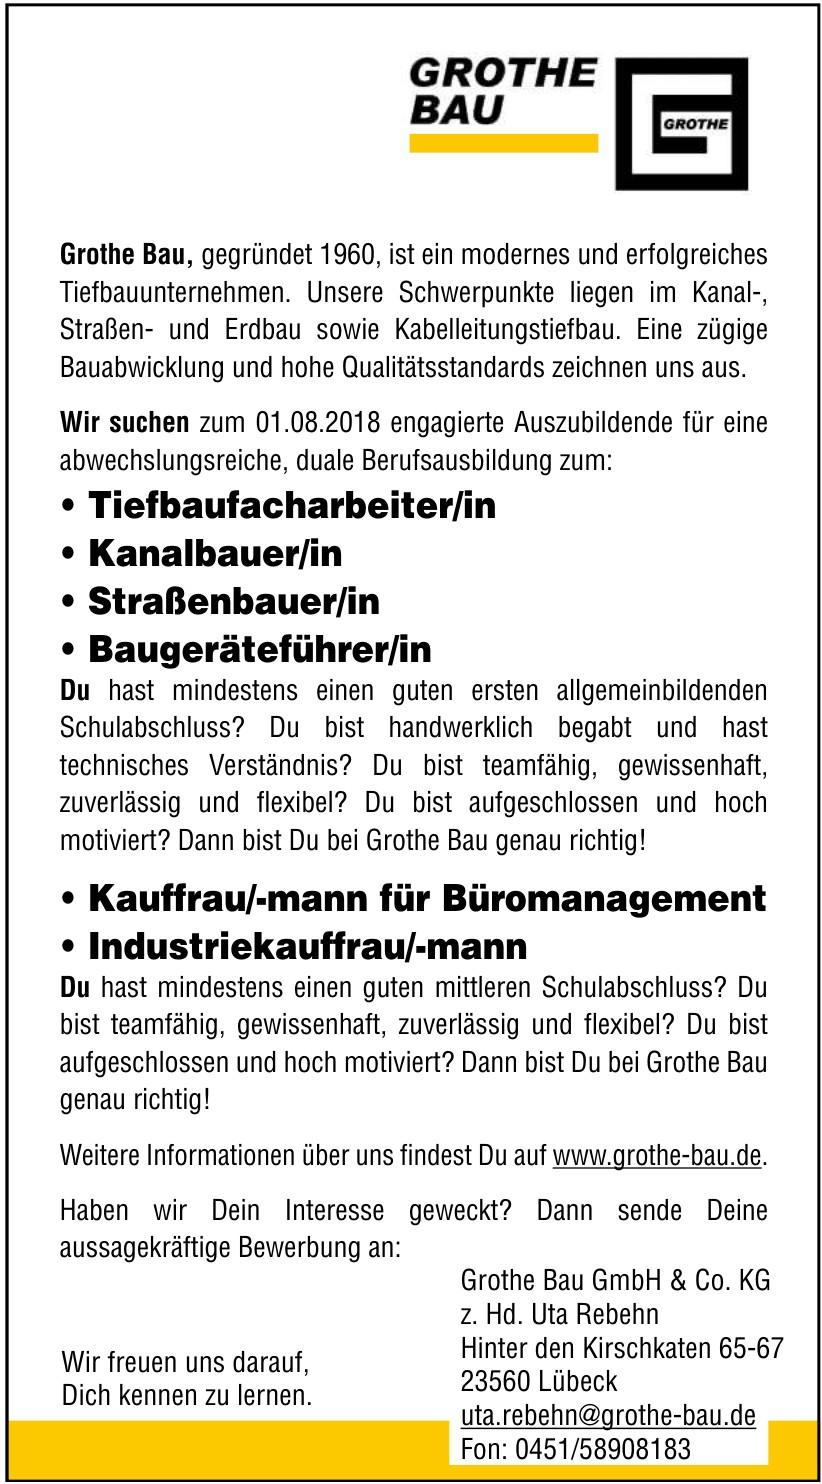 Grothe Bau GmbH & Co. KG